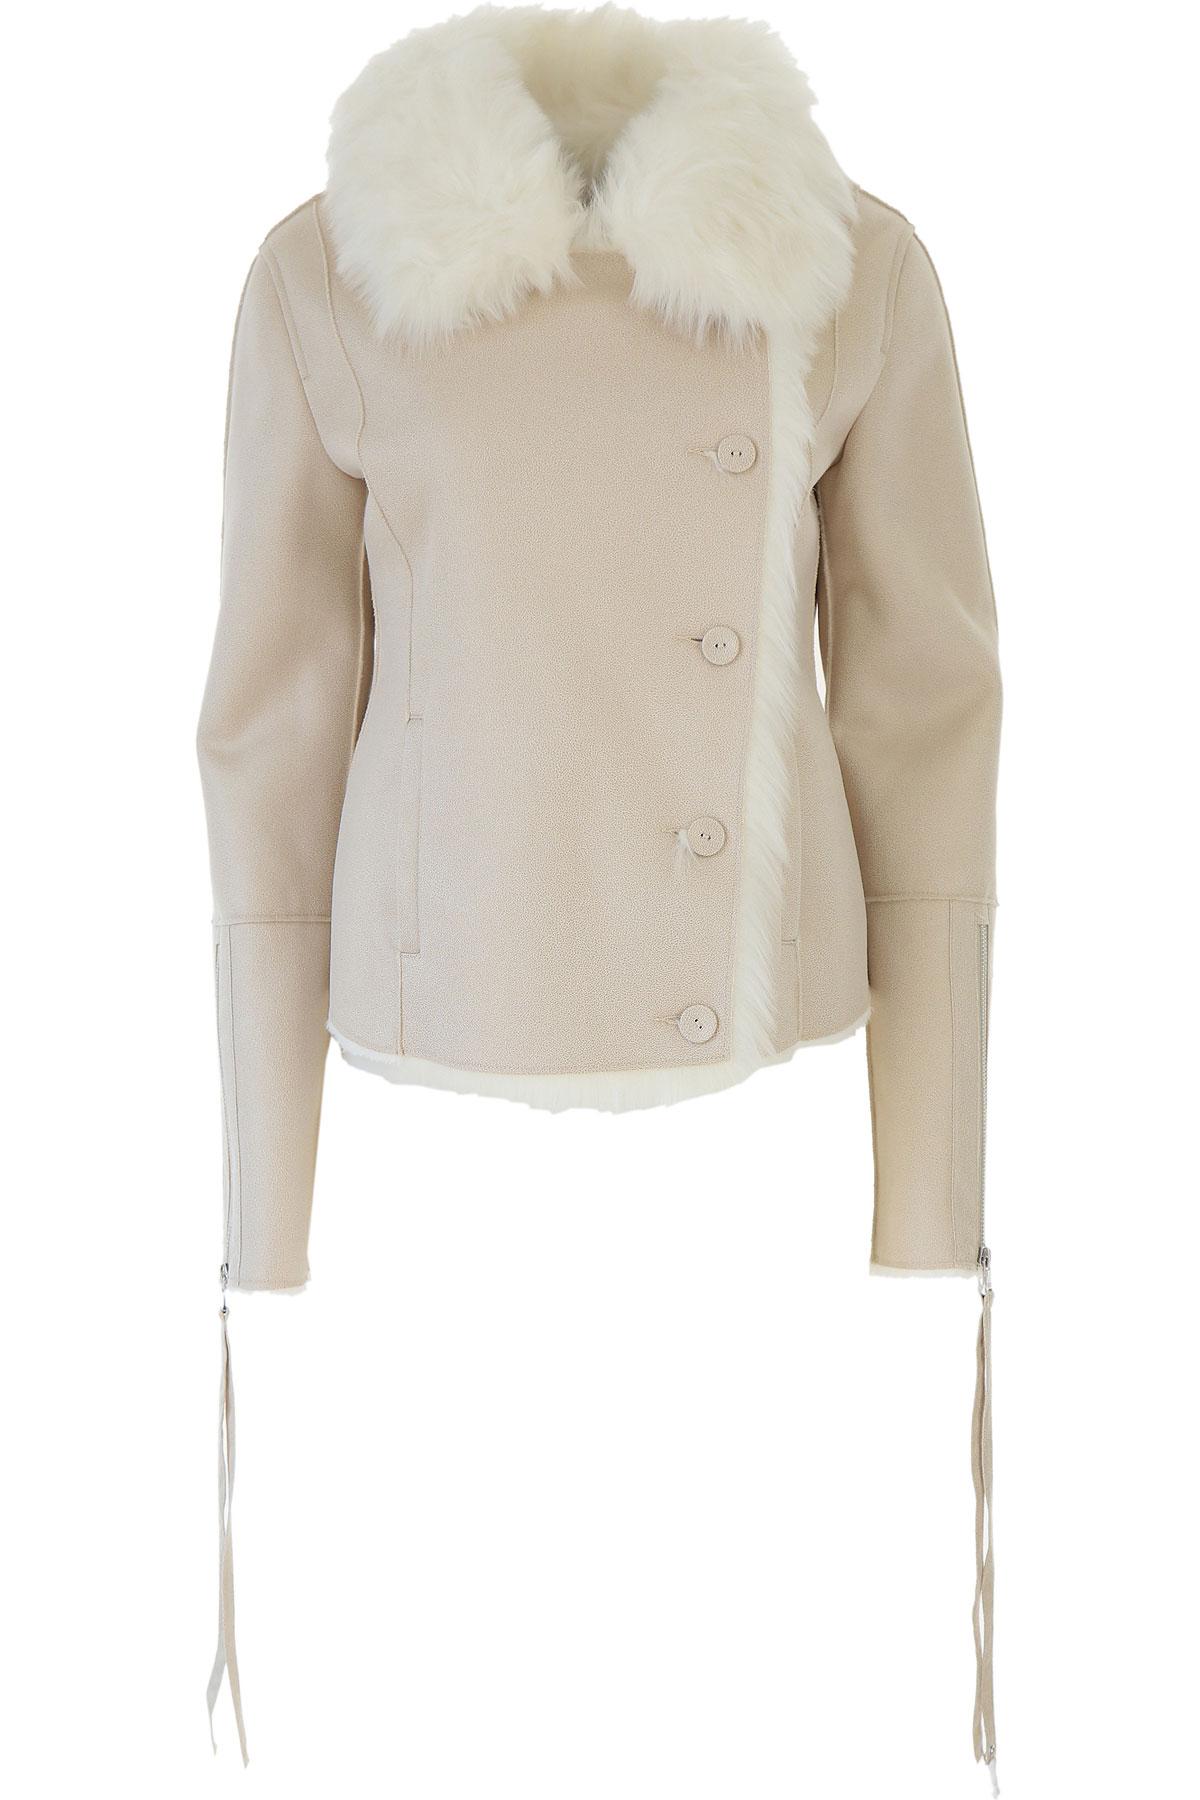 Patrizia Pepe Jacket for Women On Sale, Natural, polyurethane, 2019, 4 8